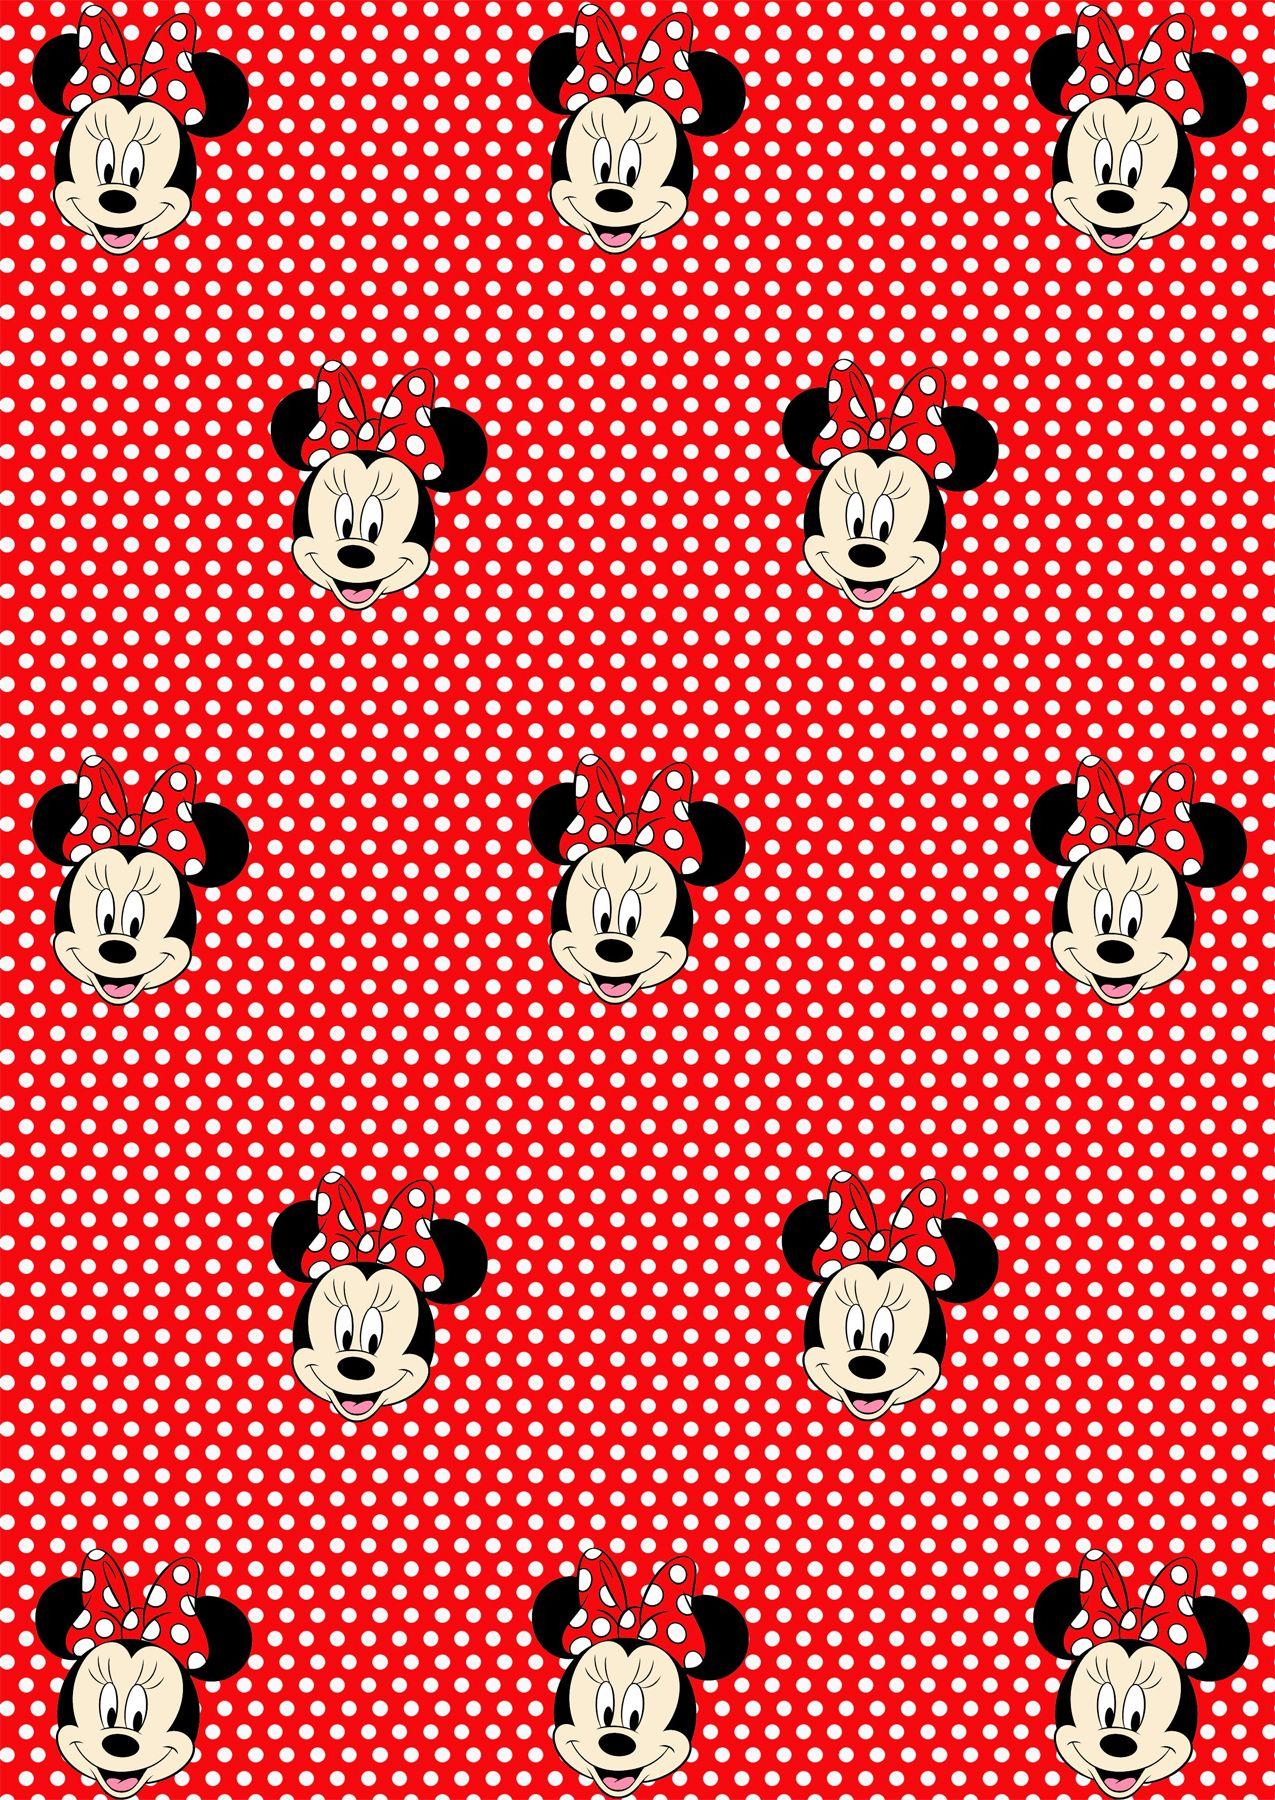 Coleccion Minniejpg (1275×1800) | FONDOS DISNEY